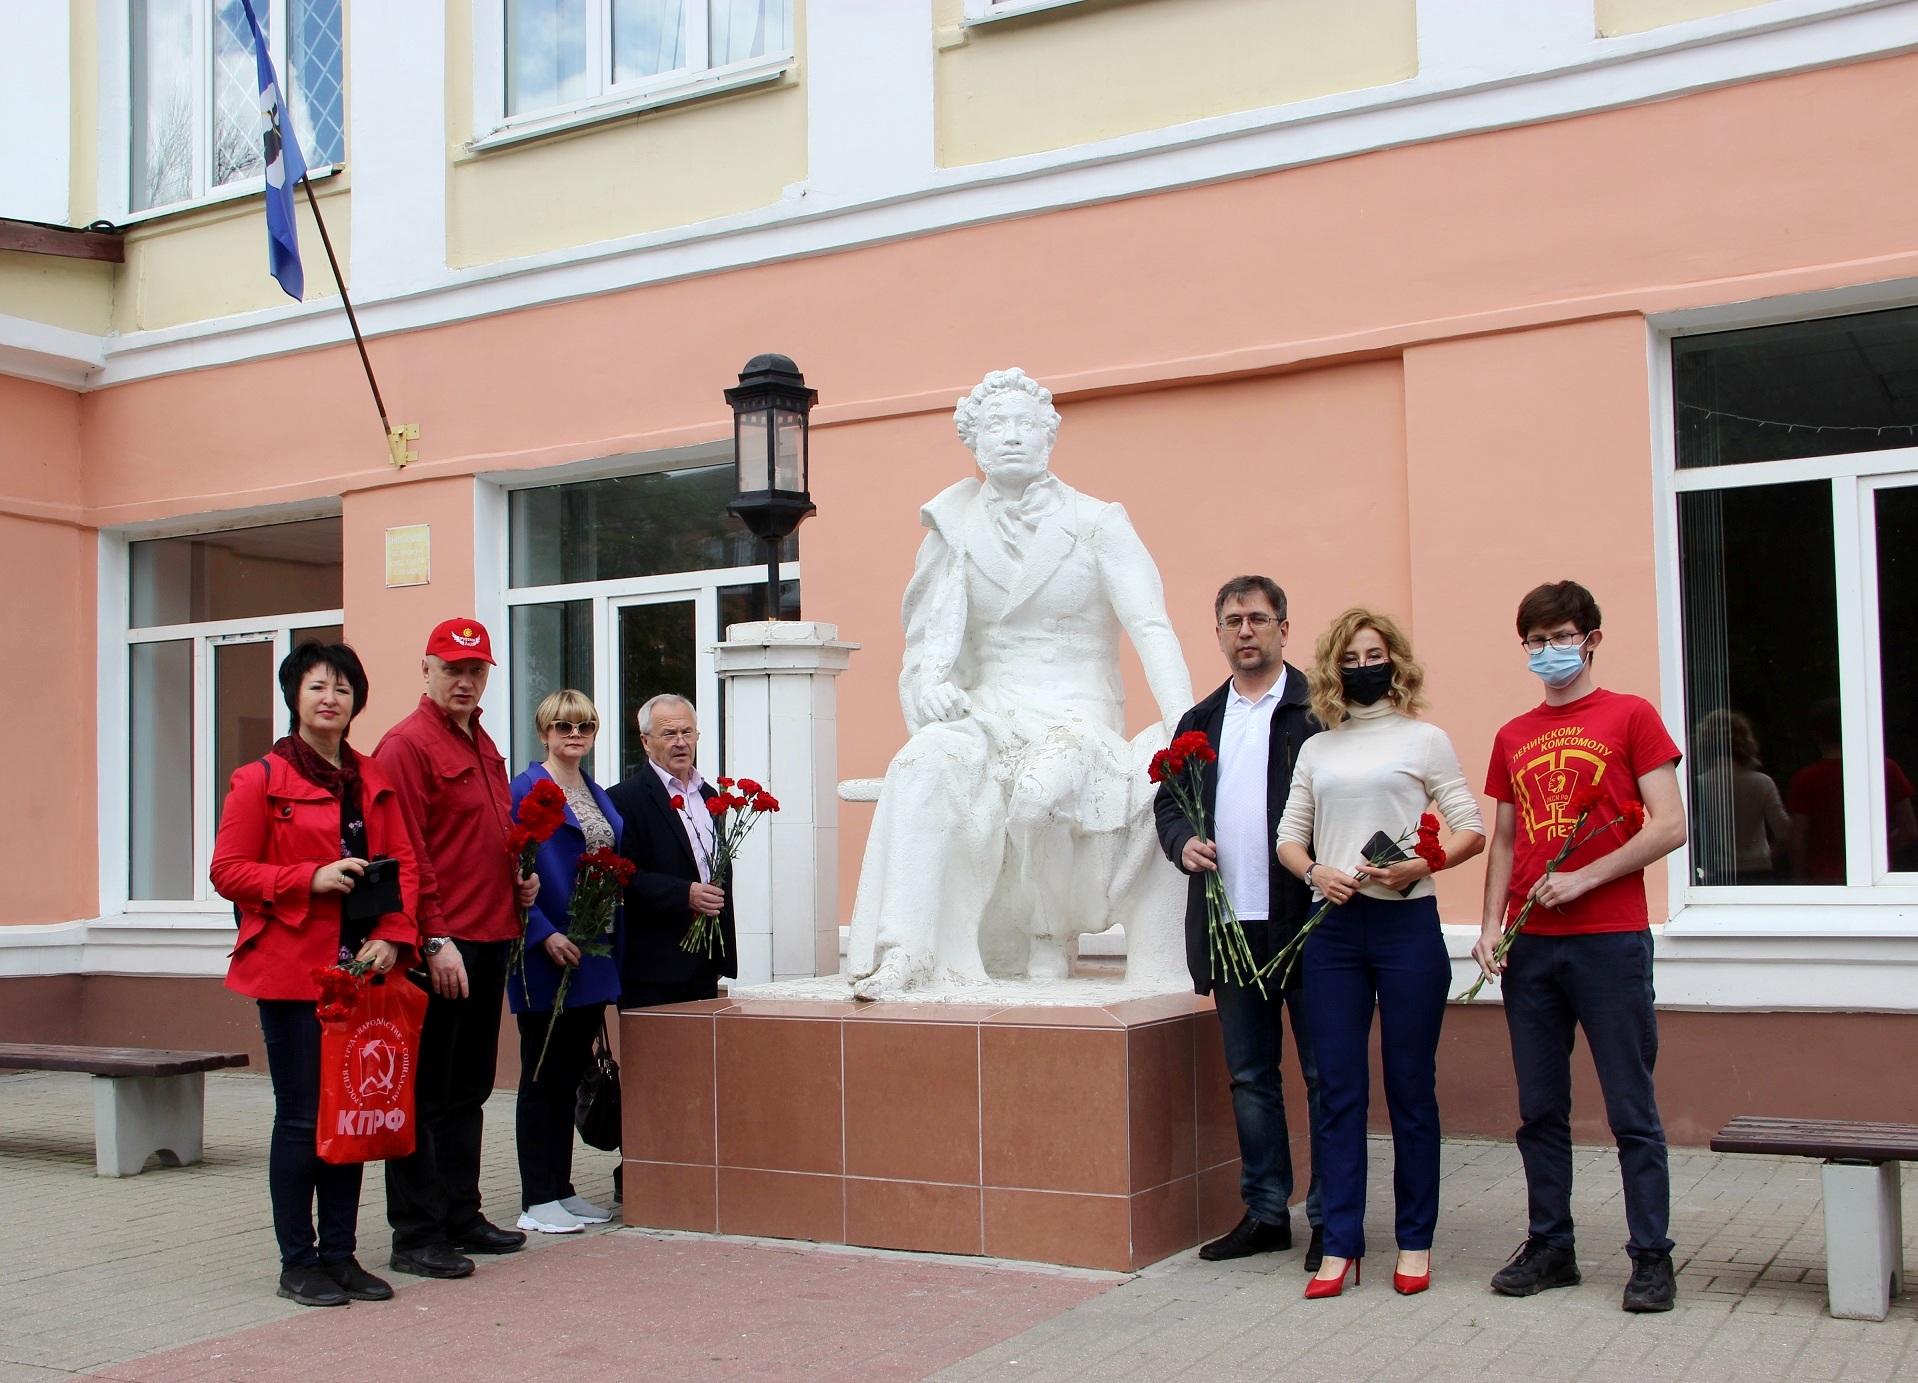 Коммунисты отдали дань памяти Александру Сергеевичу Пушкину (фоторепортаж)